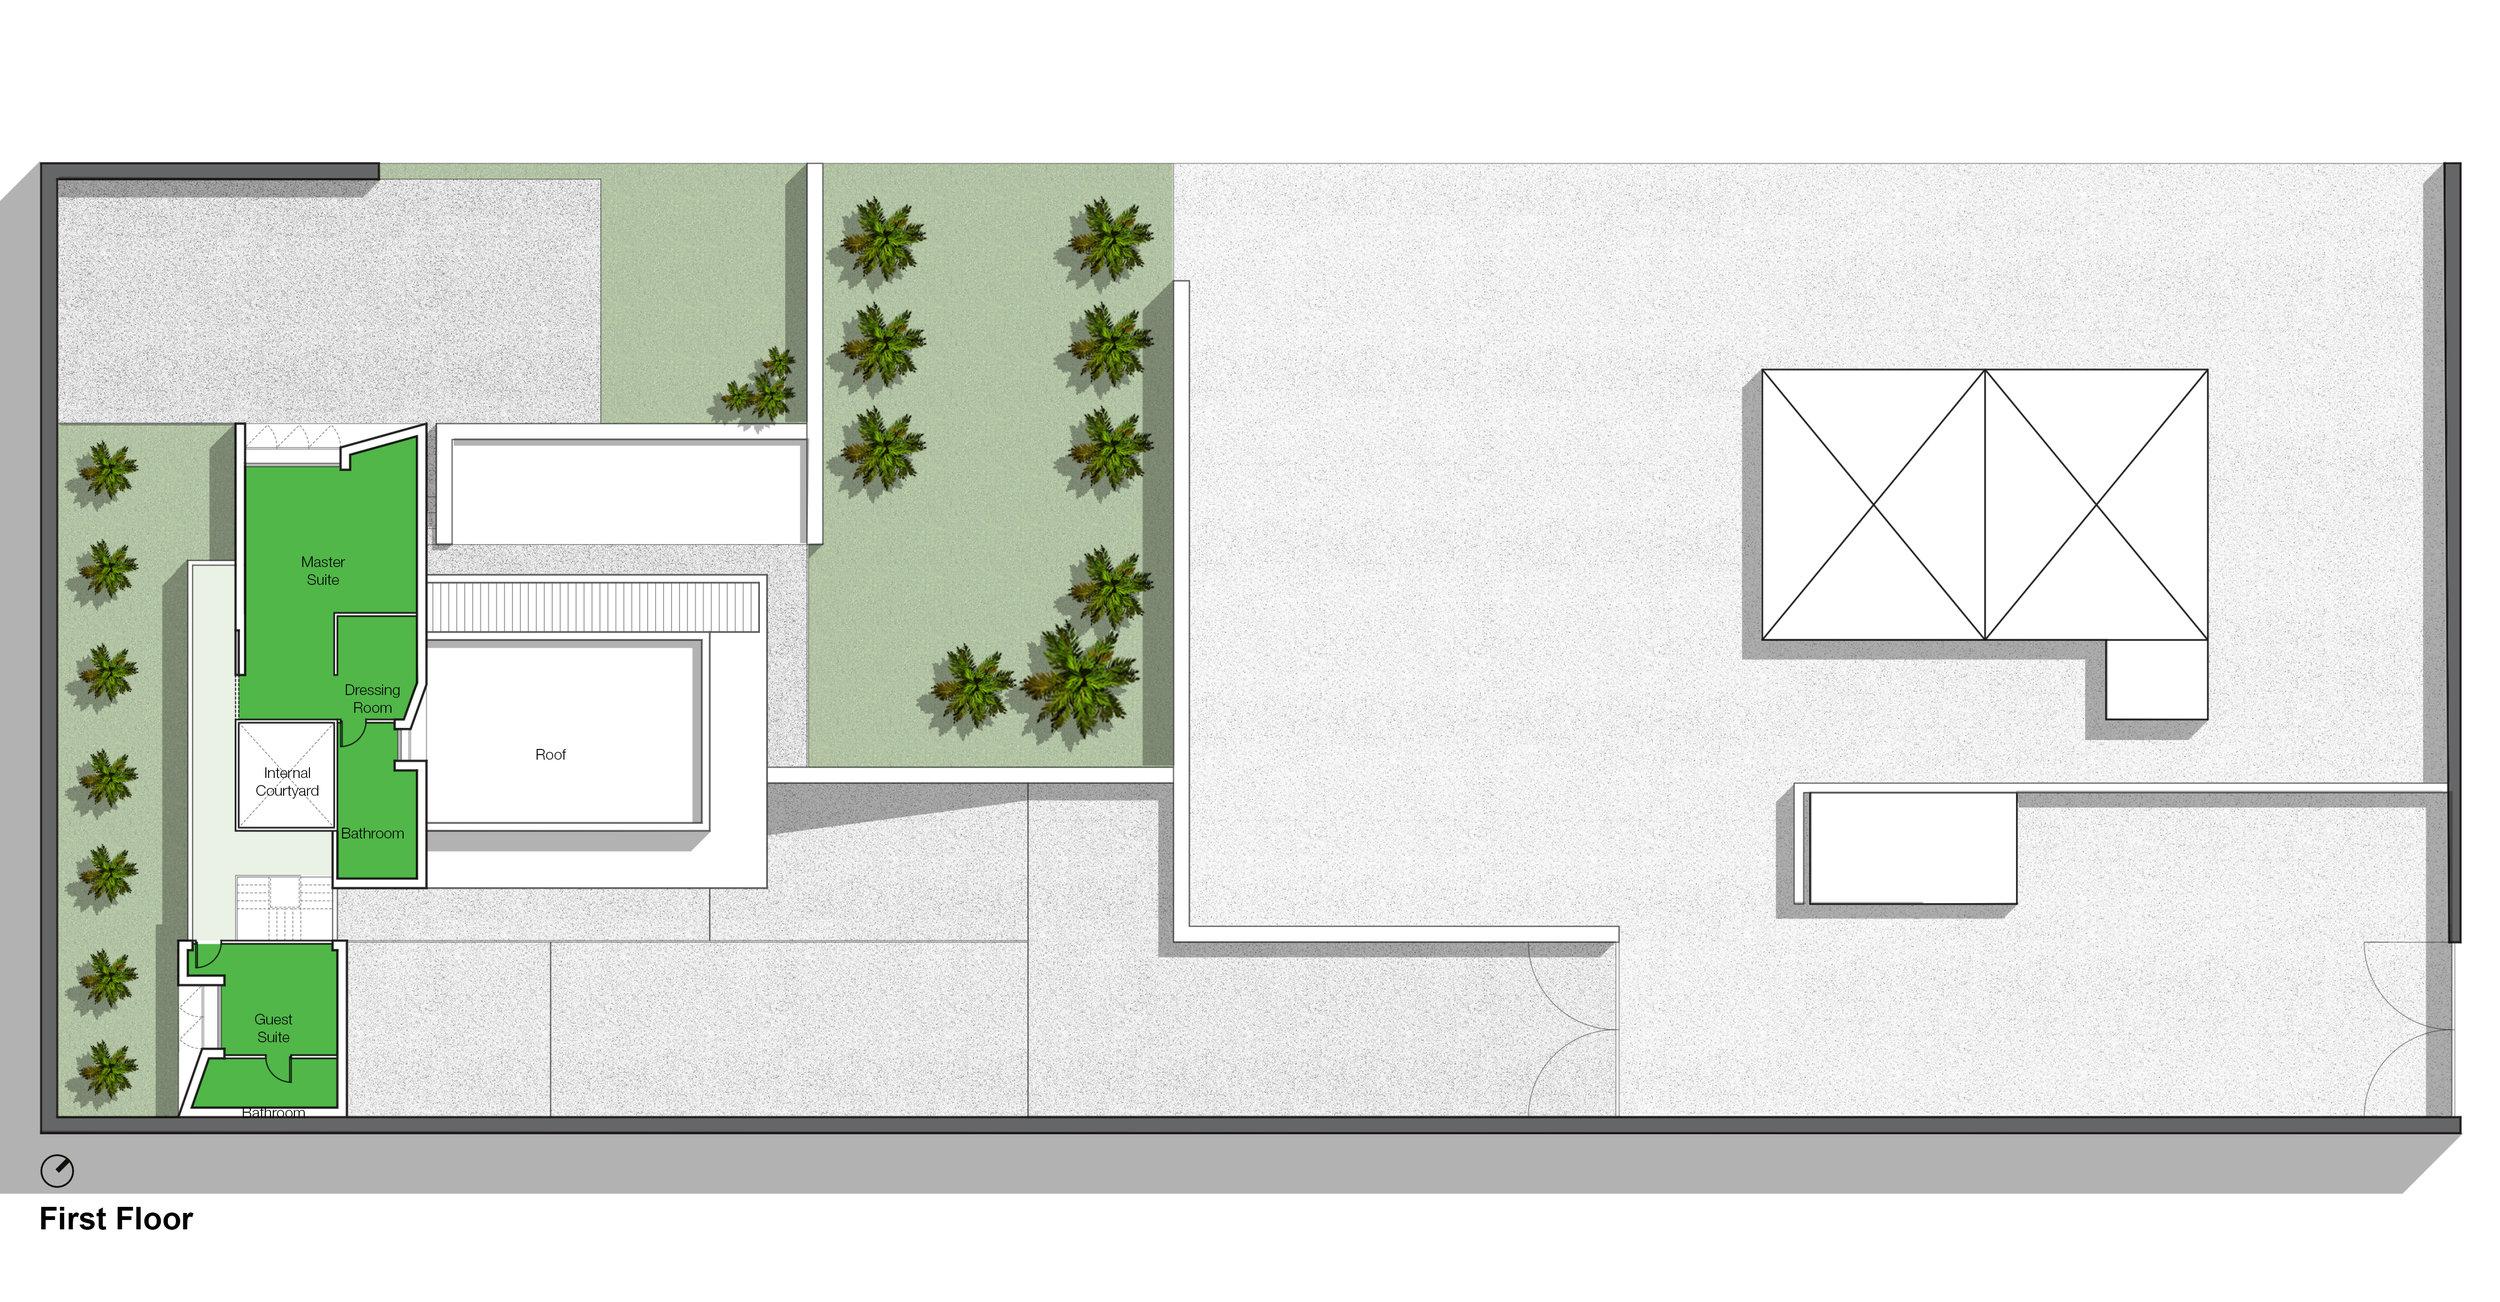 © Copyright Studio DS 2018 - the Beach Villa First Floor Plan